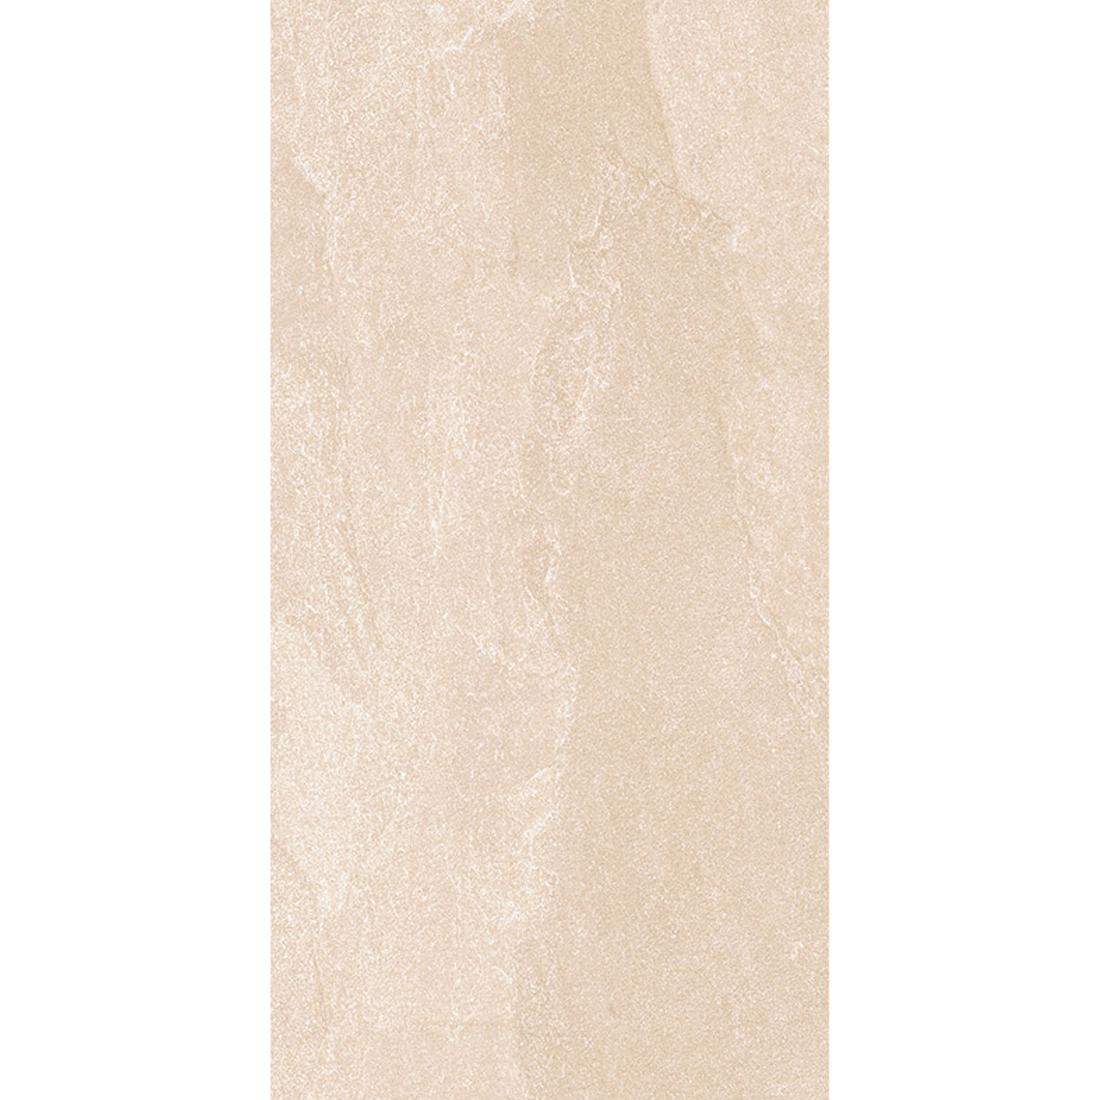 Nitco Nordic Cream N5002 Matte Glazed Vitrified Tile